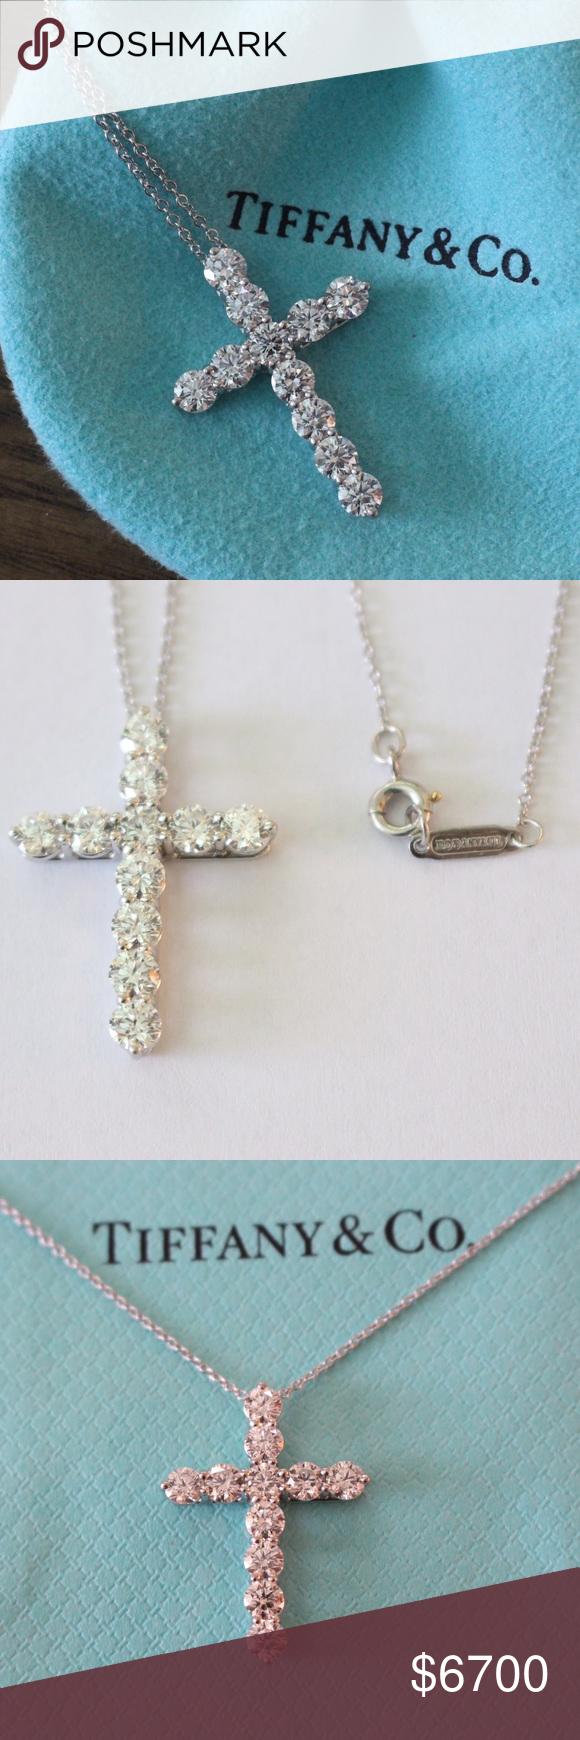 dad9b3cb91c0e Tiffany & Co Large Diamond Cross 1.71 ct, PT950 Tiffany & Co Diamond ...